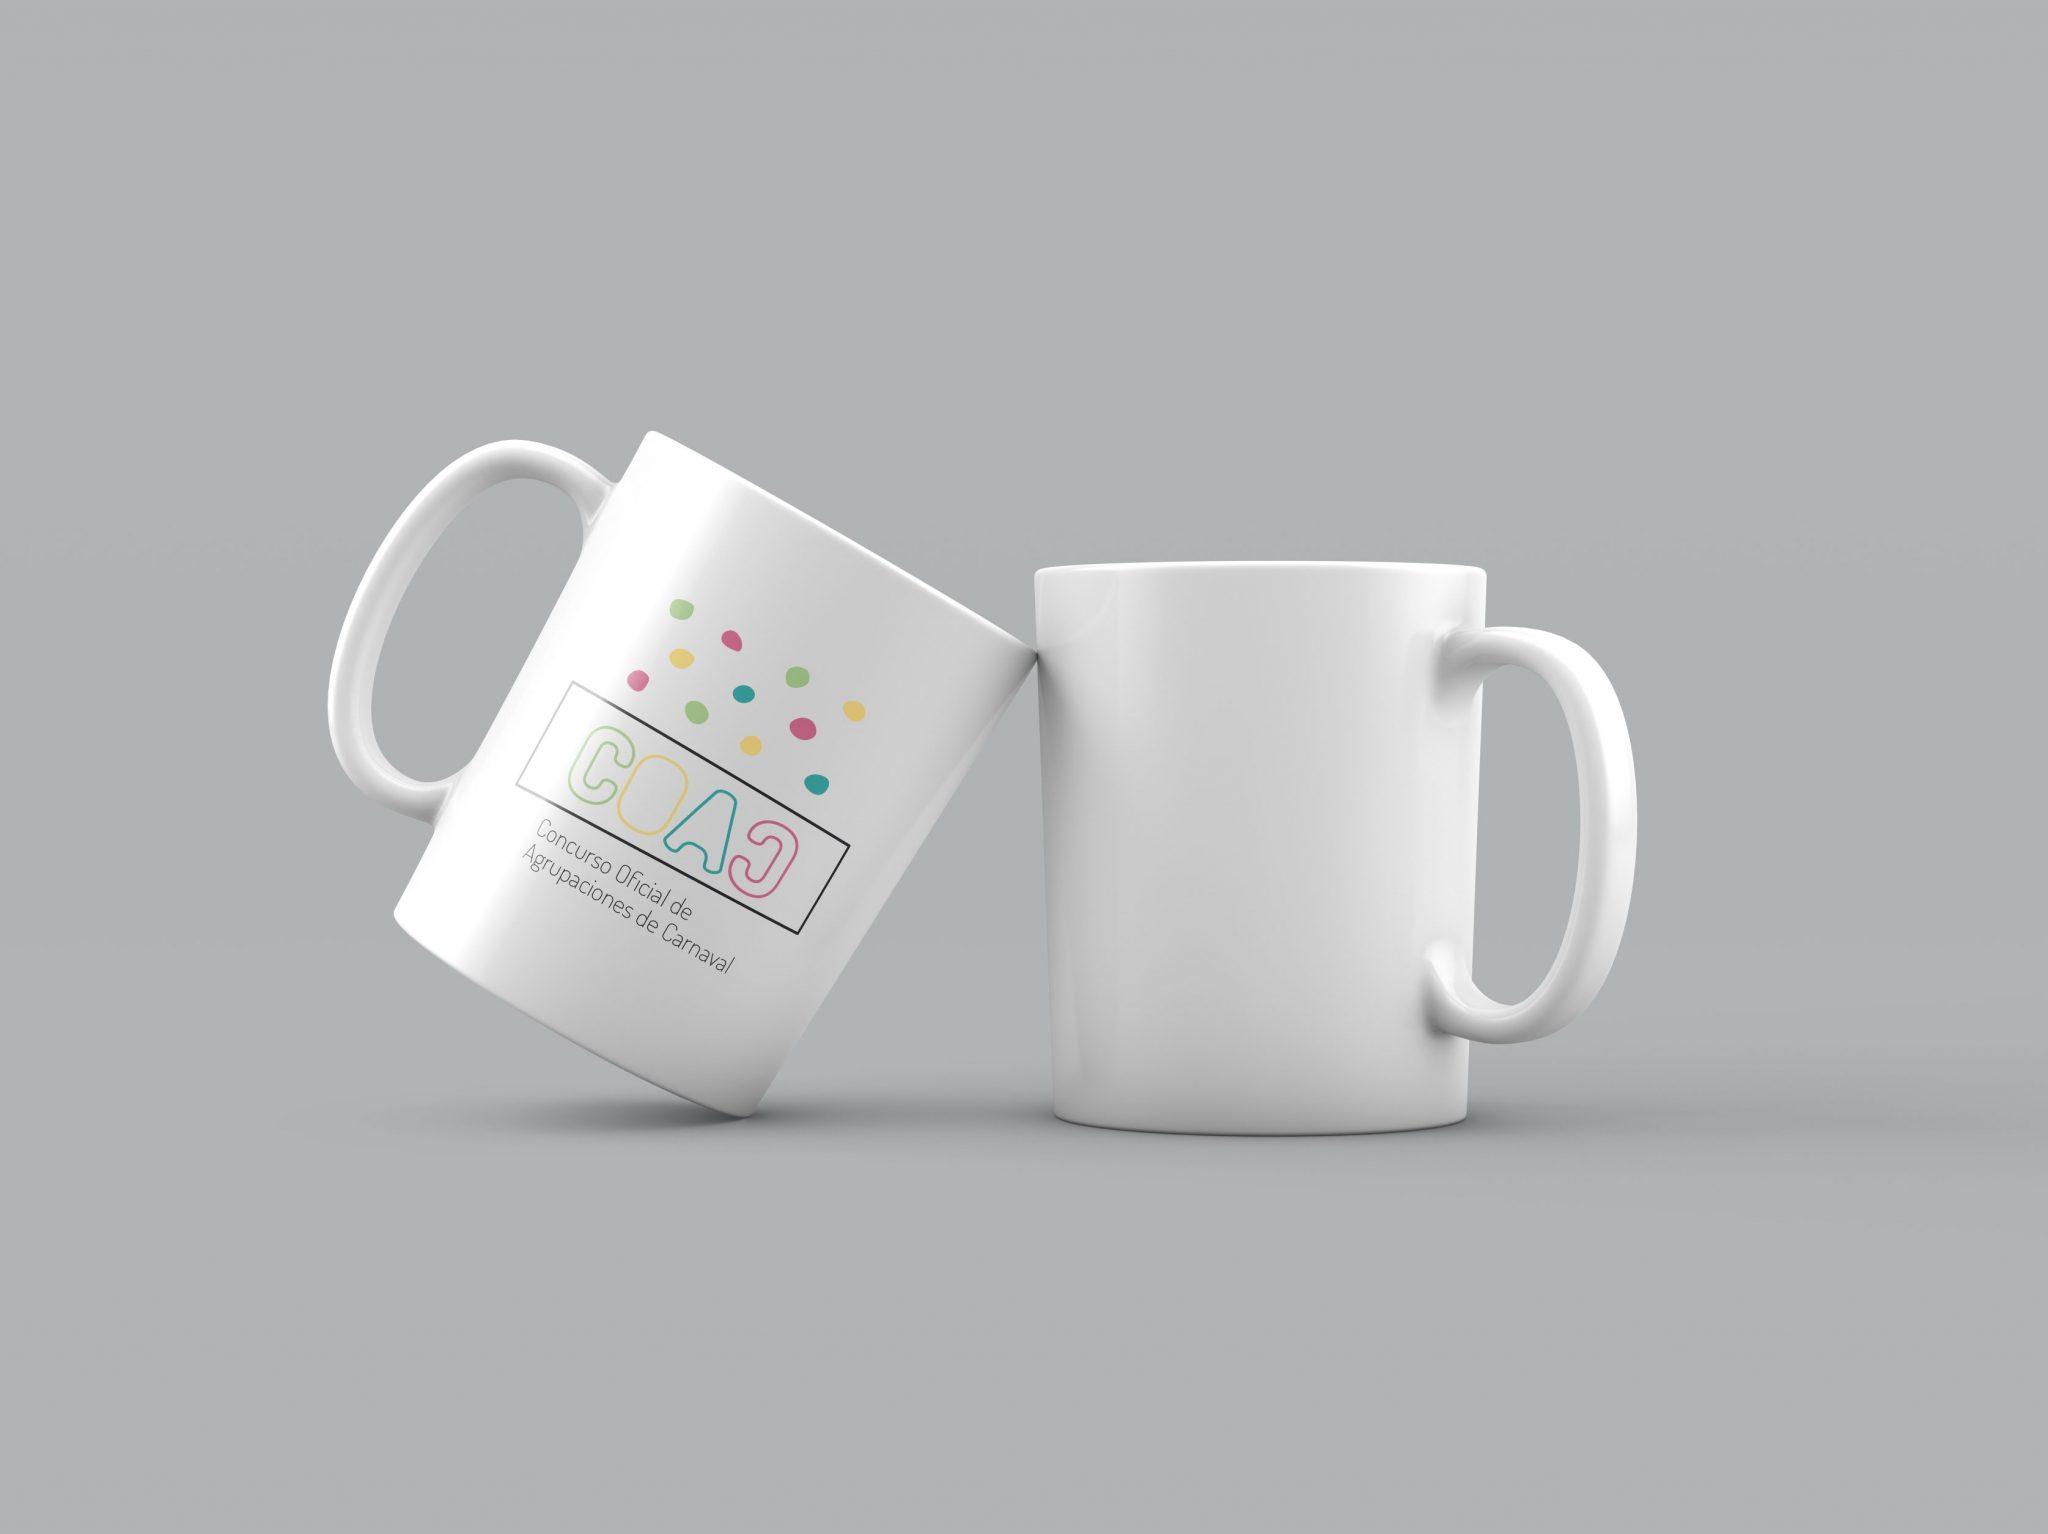 COAC 2018 Merchandising